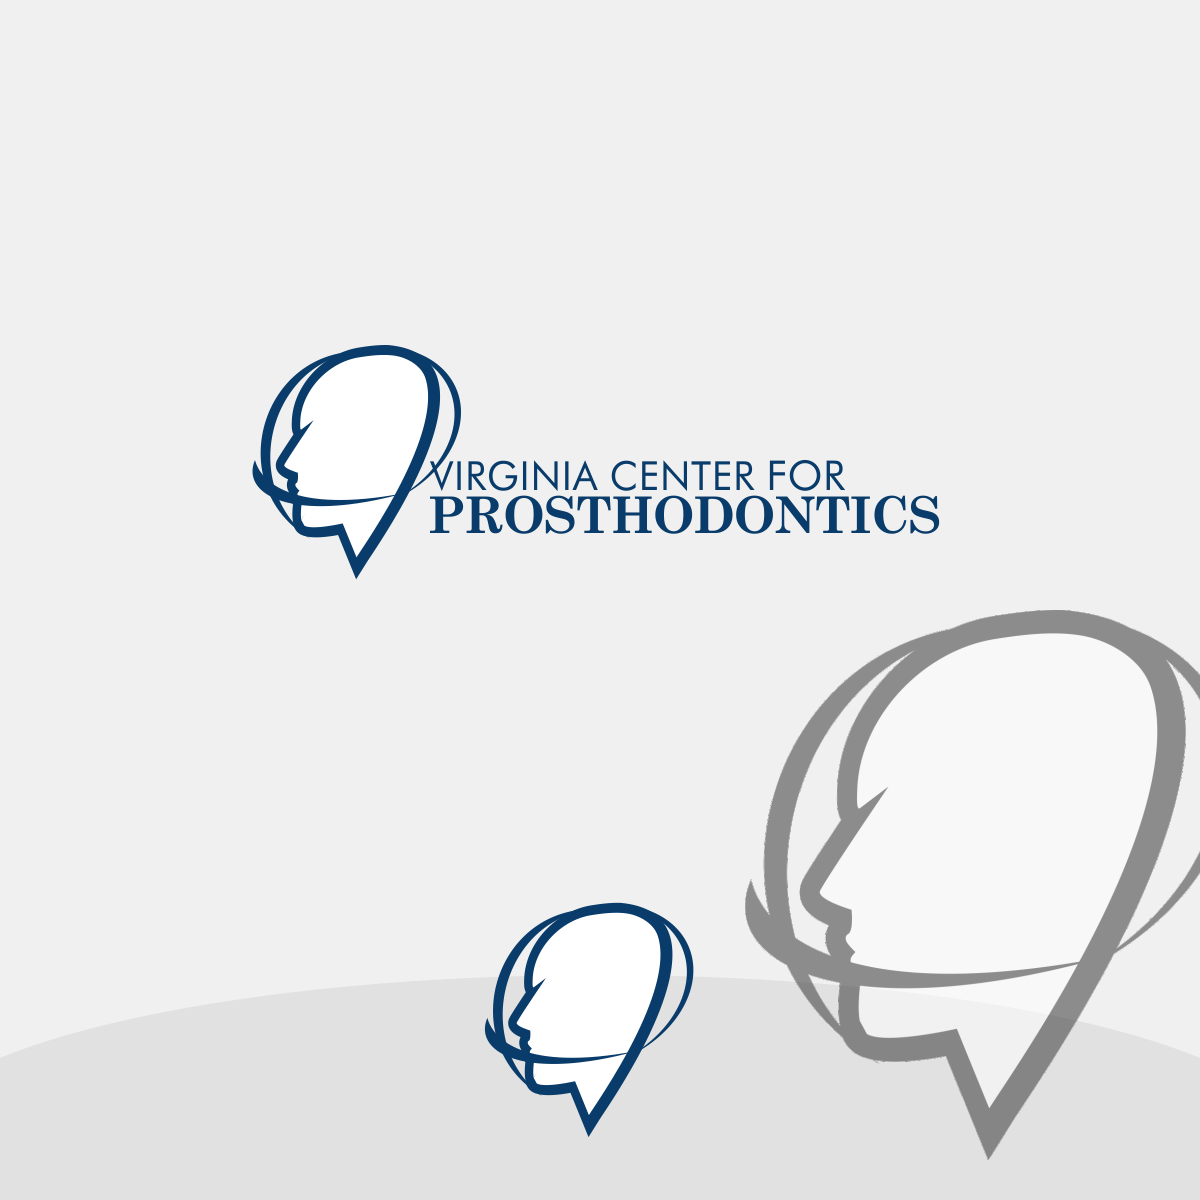 Logo Design by Private User - Entry No. 73 in the Logo Design Contest Imaginative Logo Design for Virginia Center for Prosthodontics.